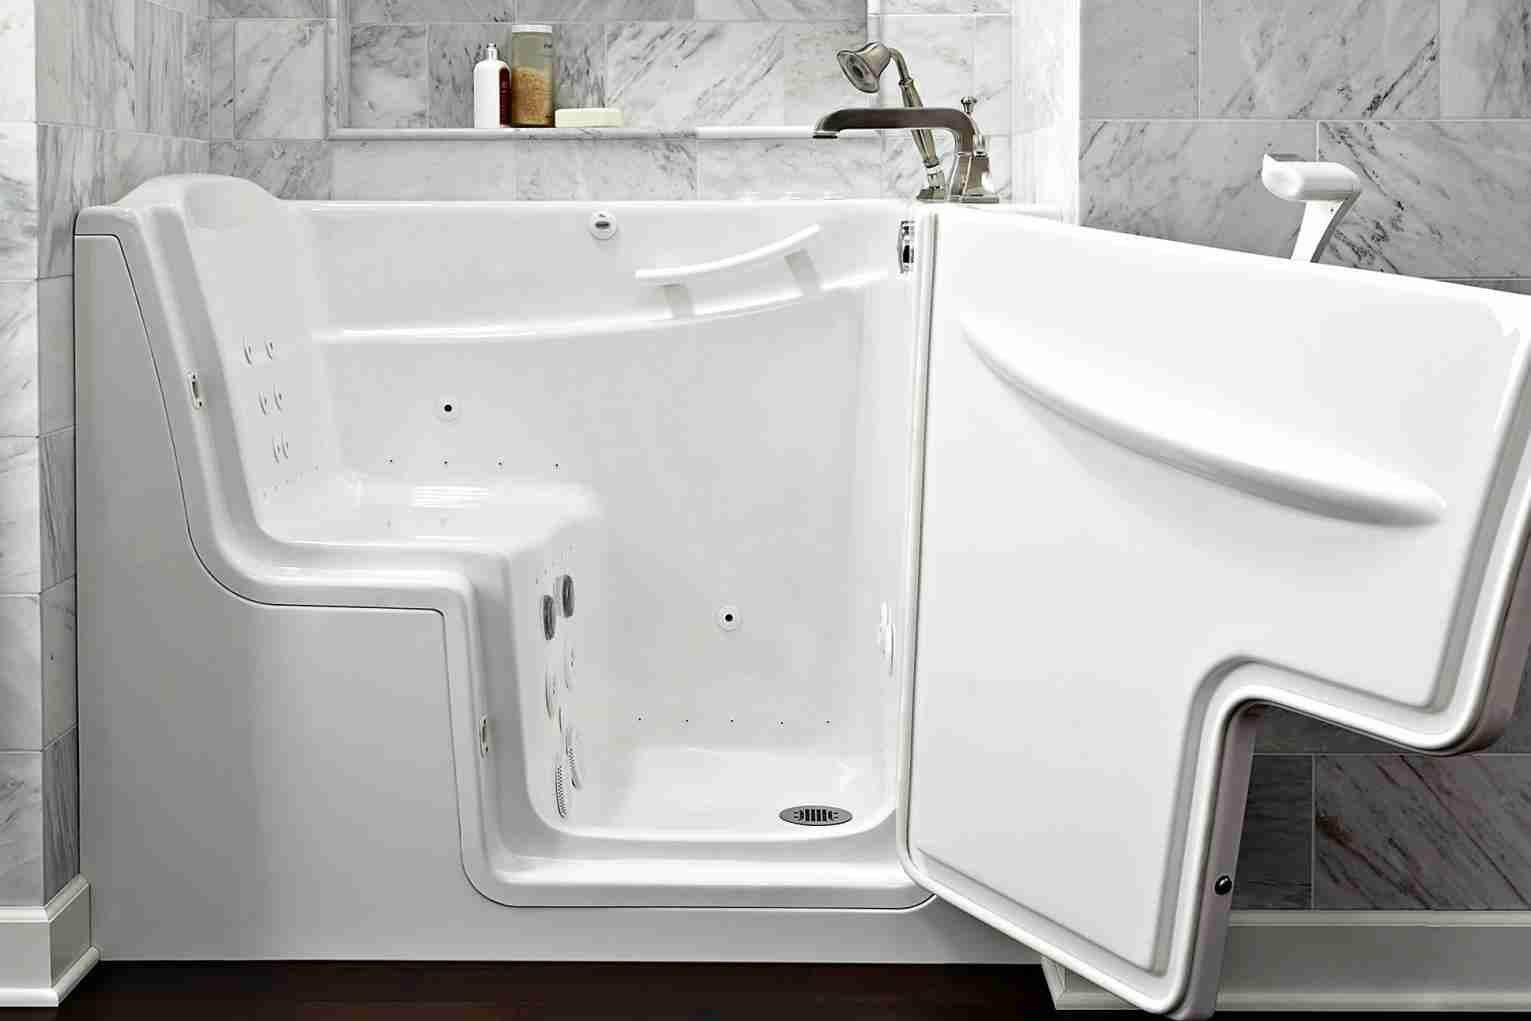 Senior Bathtubs With Doors With Images Walk In Bathtub Walk